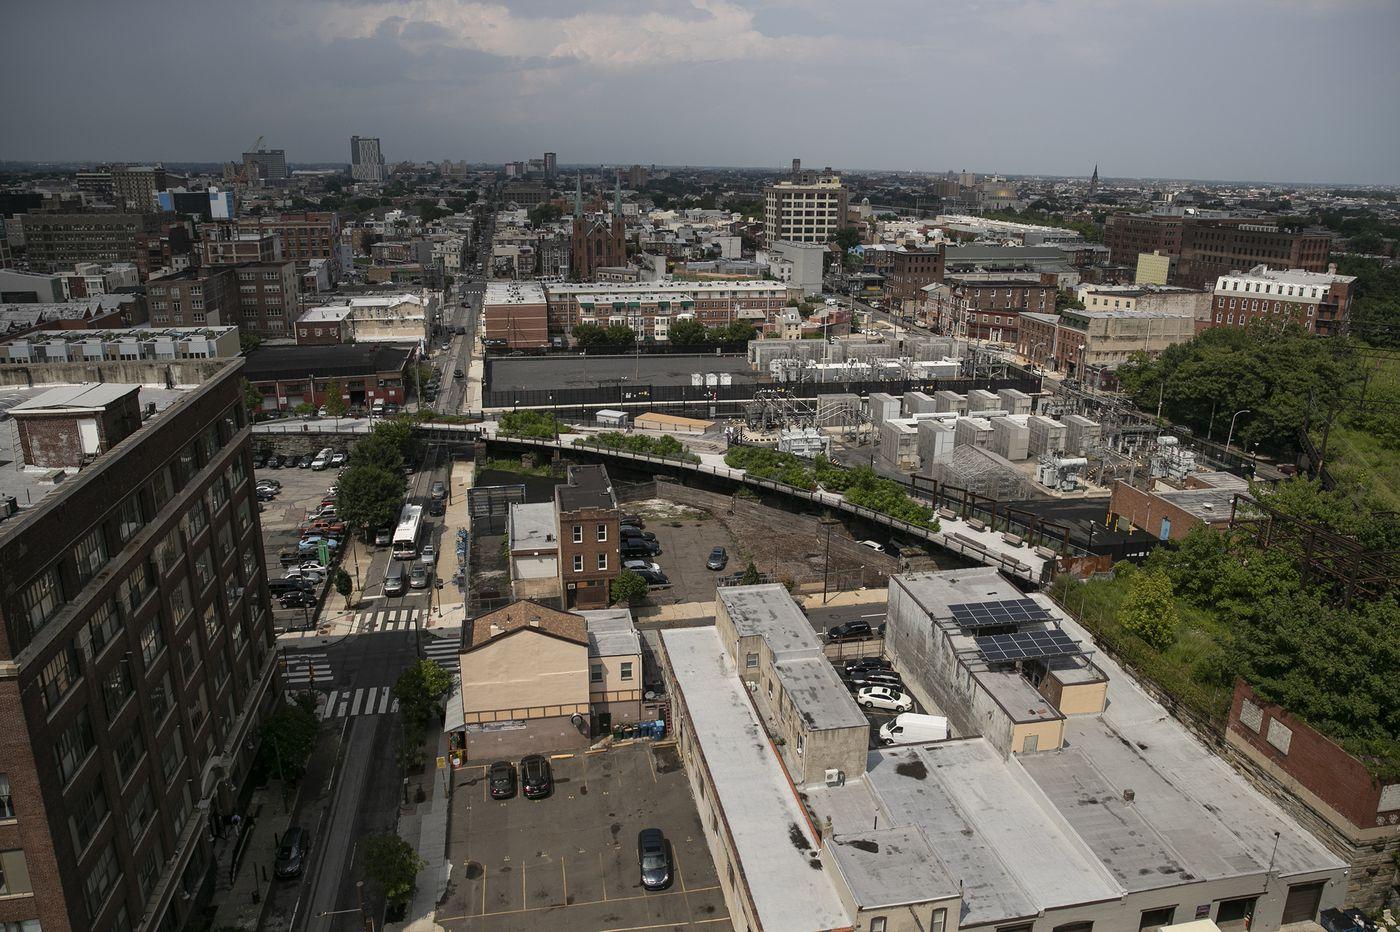 Whatever you call the neighborhood around Philly's new Rail Park, it needs improvement | Inga Saffron